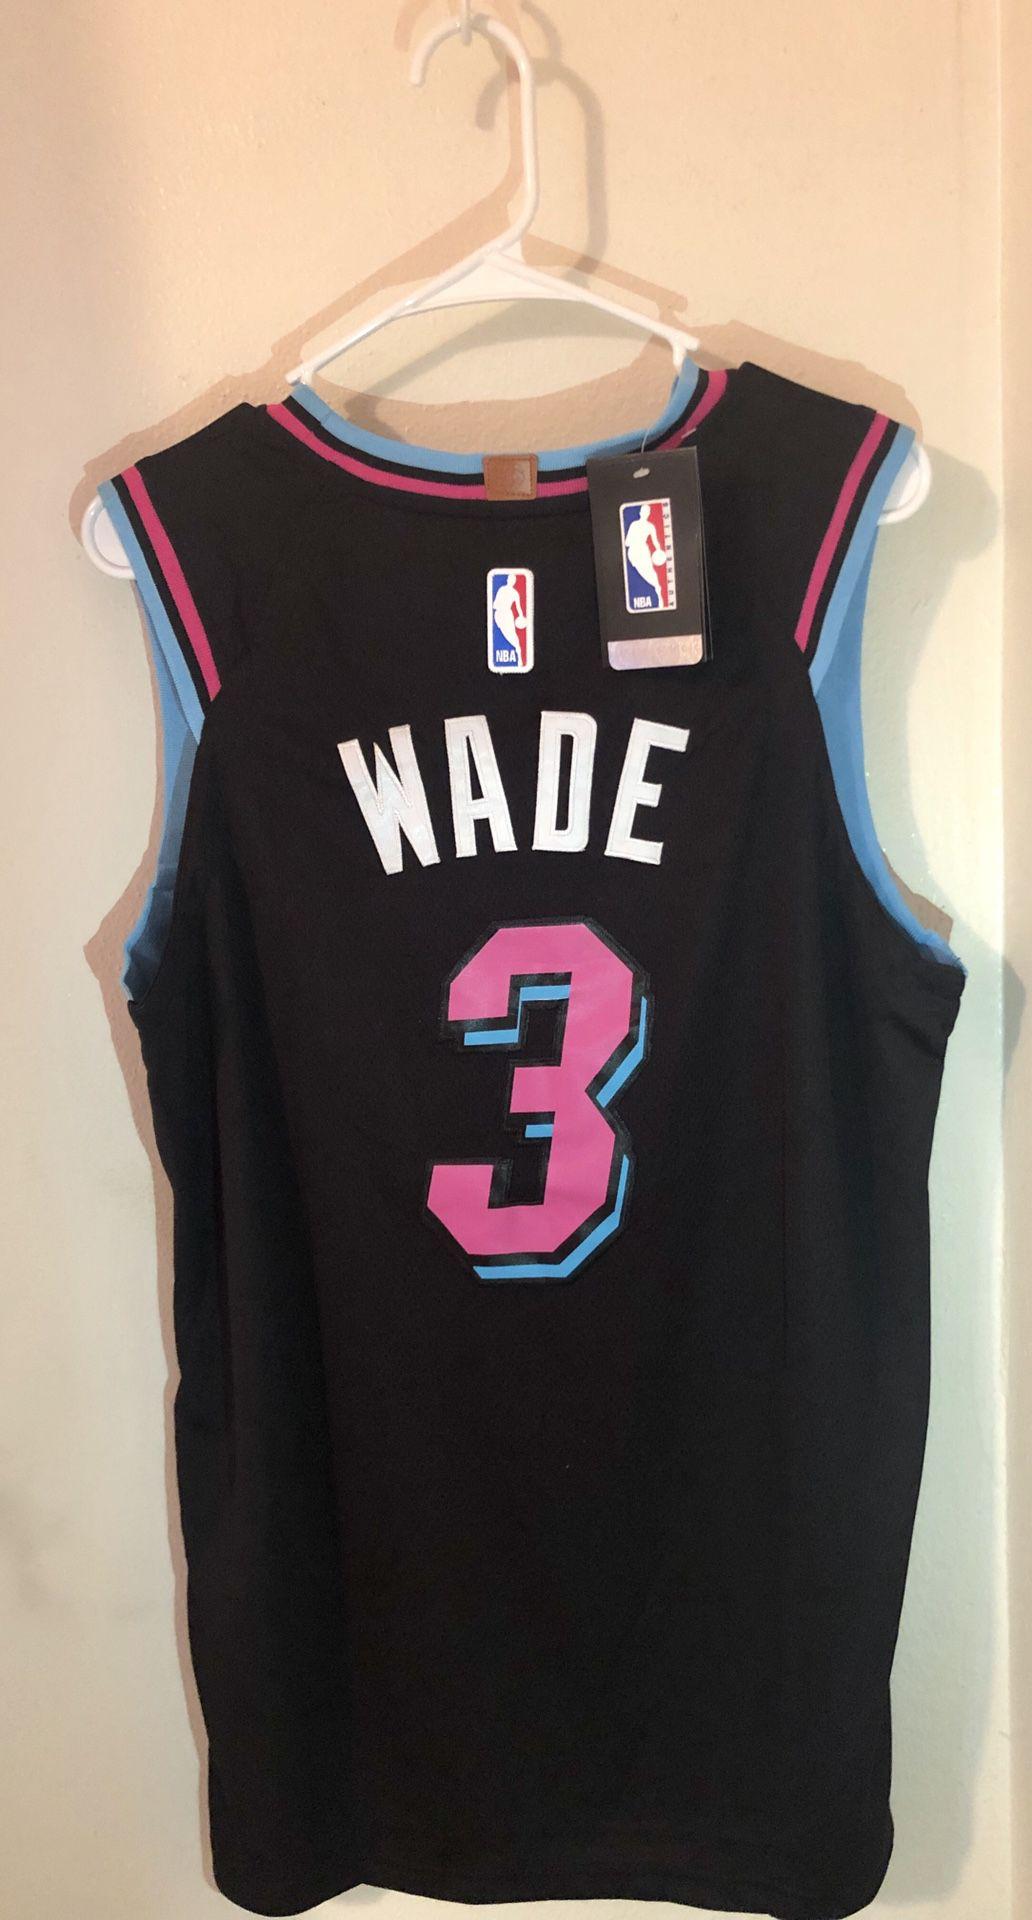 Wade NBA Jersey